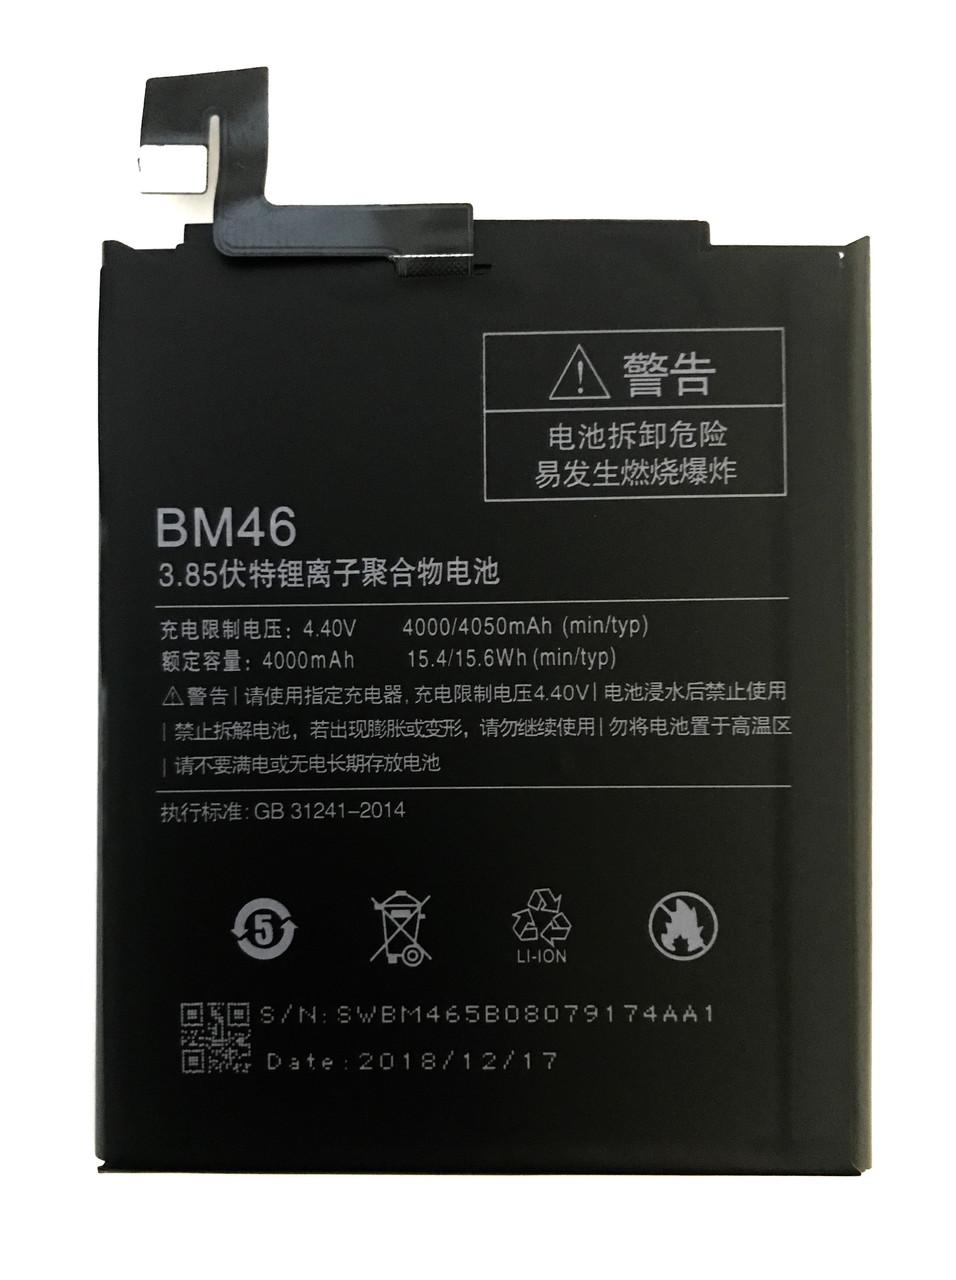 Акумулятор BM46 для Xiaomi Redmi Note 3, Redmi Note 3 Pro, Redmi Note 3 Pro SE Батарея